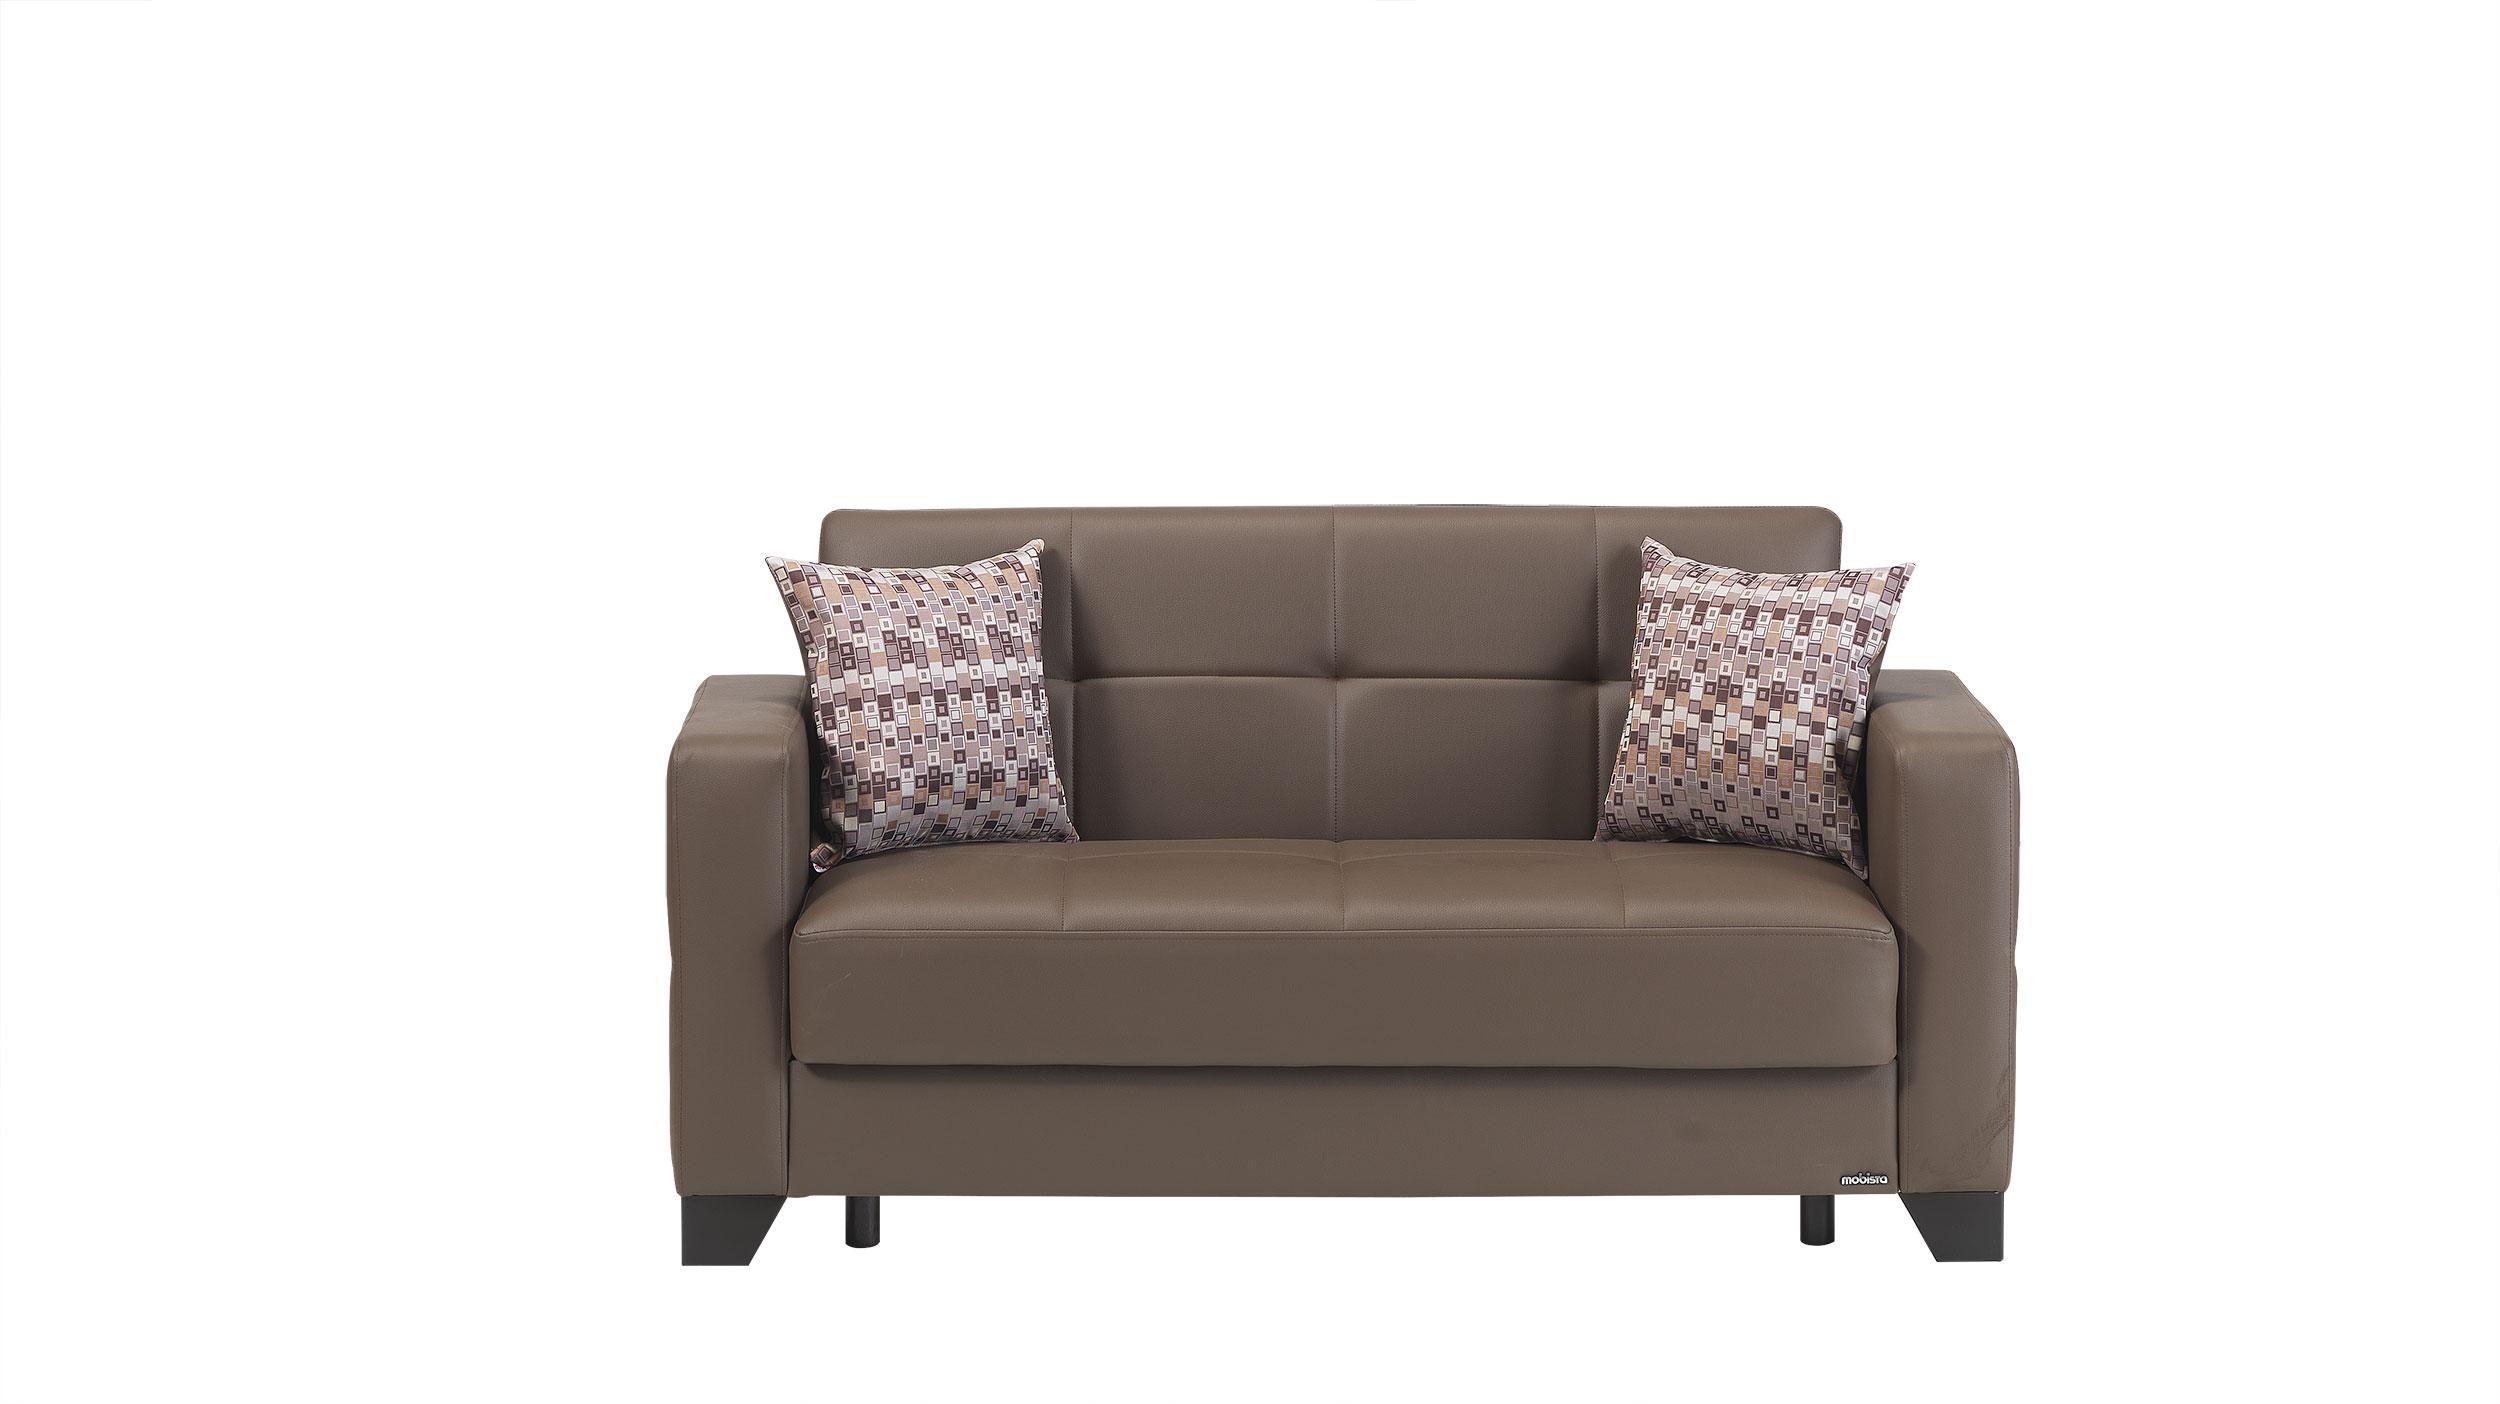 leatherette sofa durability usado curitiba viva italia prestige brown loveseat bed by mobista